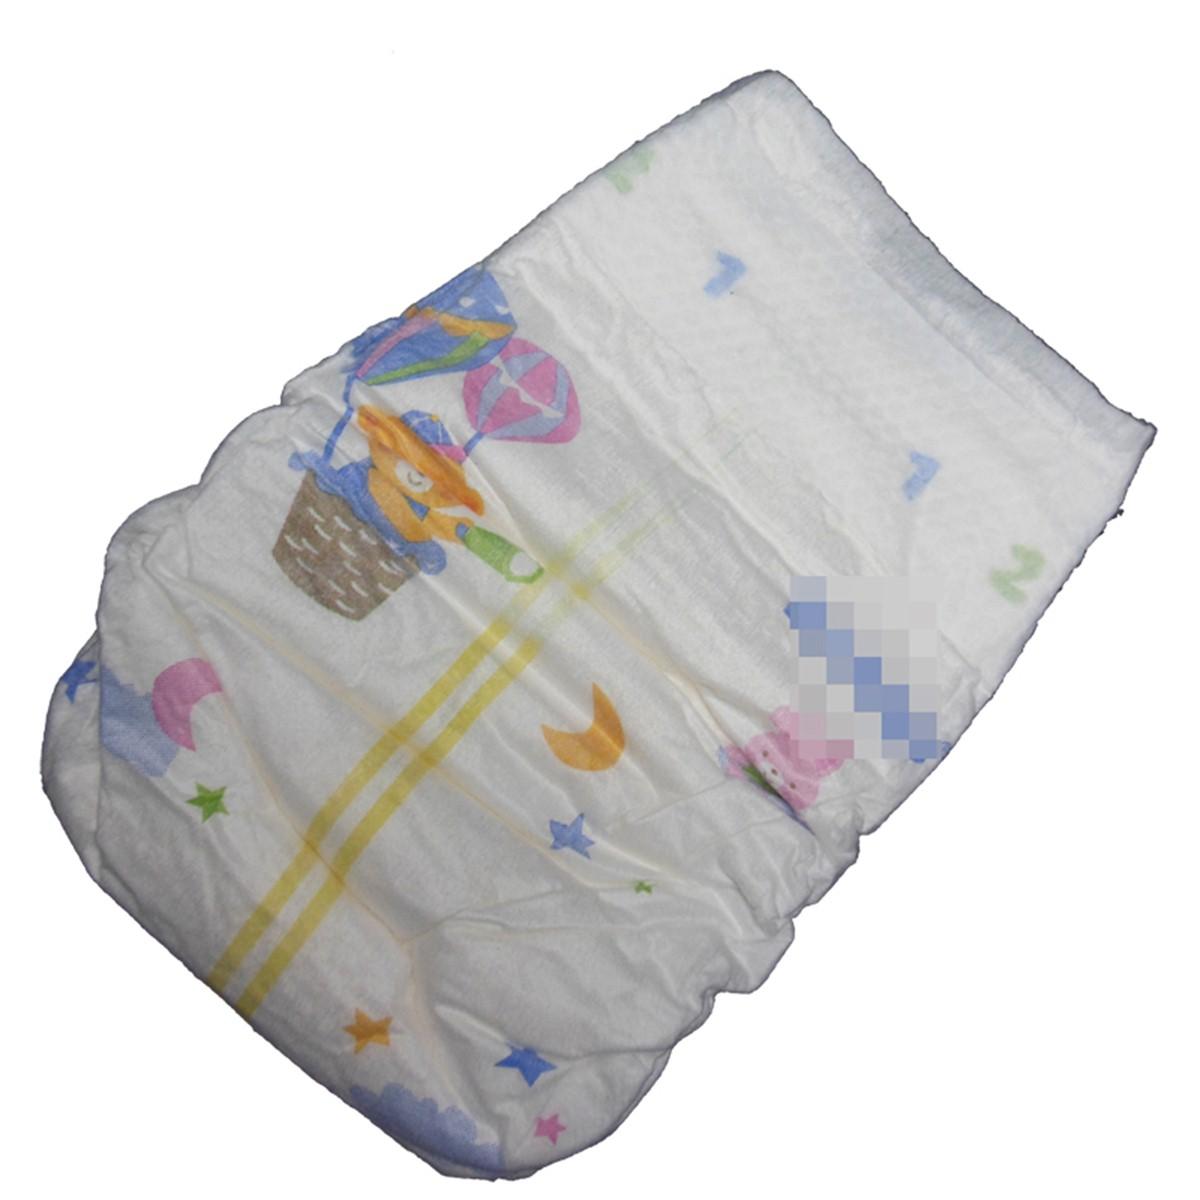 Buy Cheap Newborn Baby Diapers Online